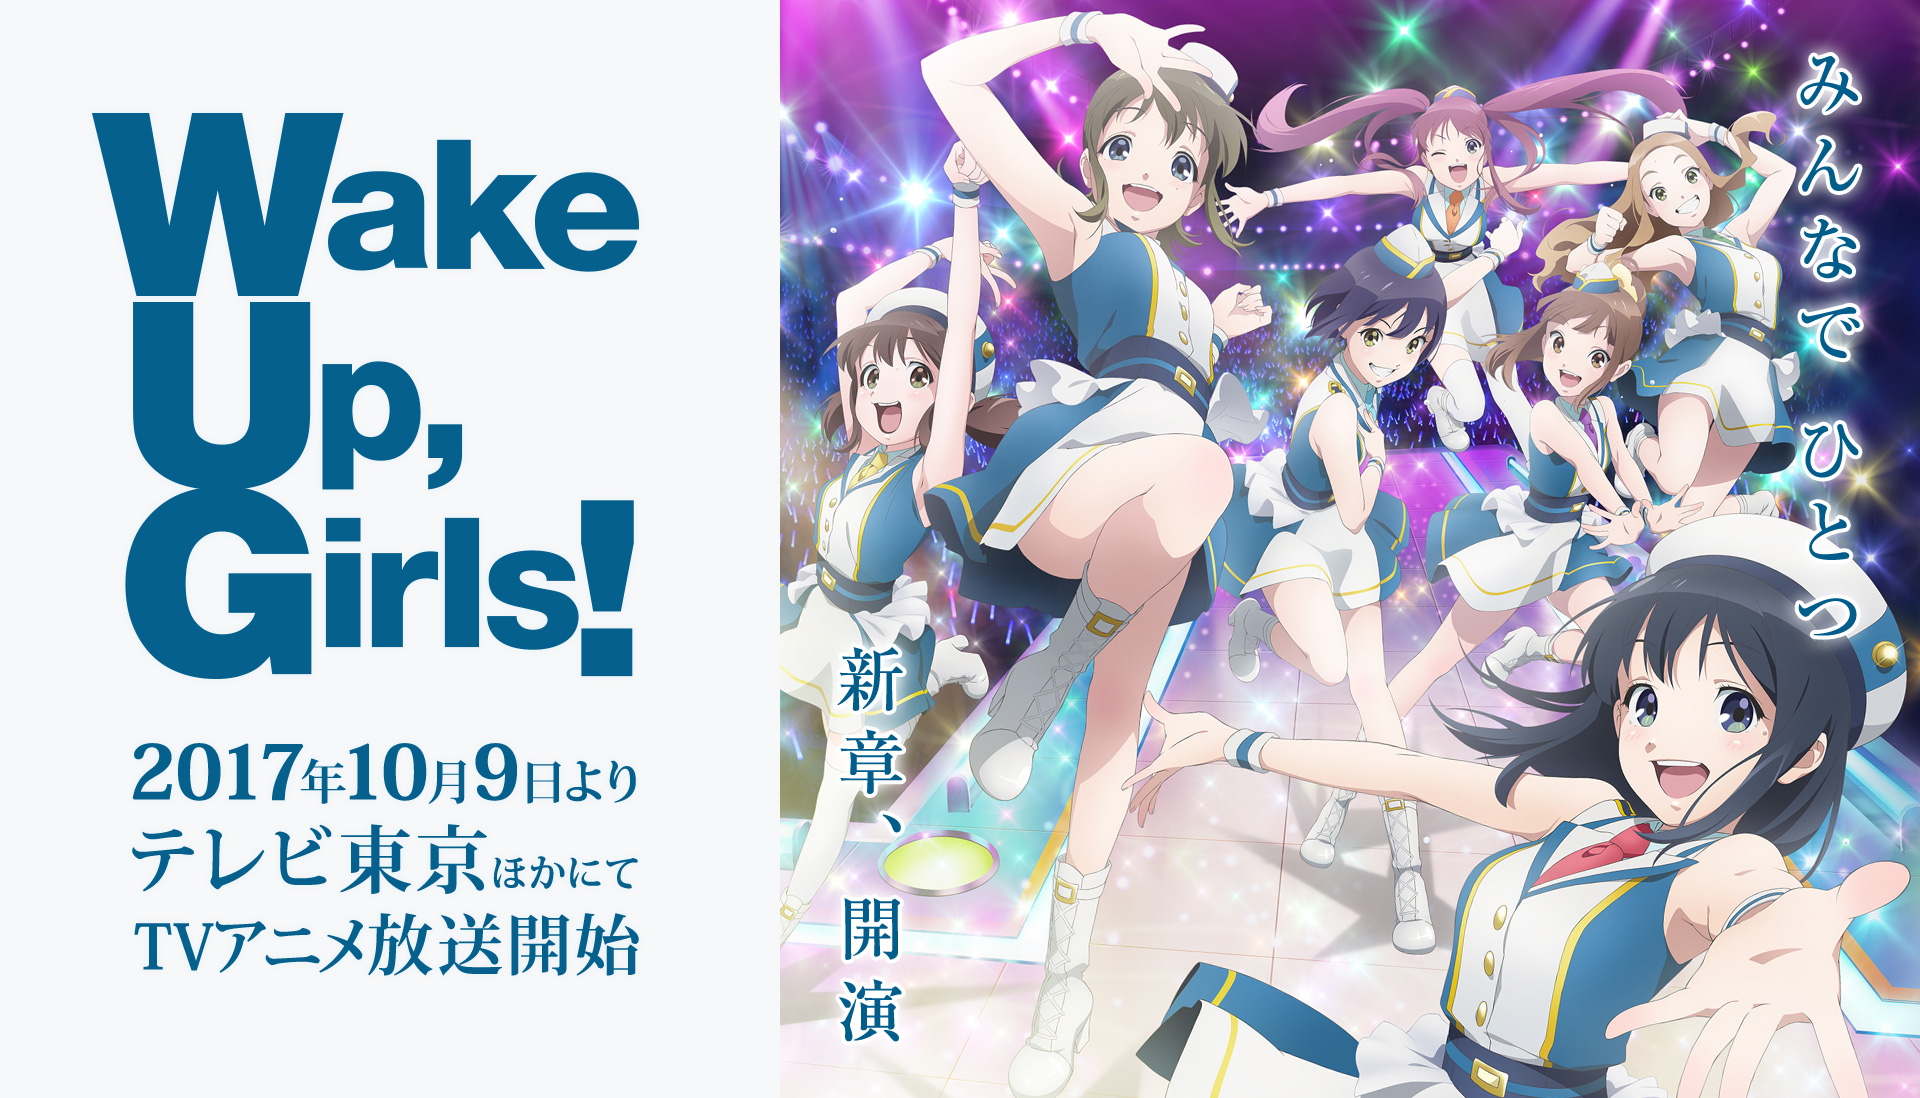 Wake Up, Girls!新章 2017年TVアニメ放送